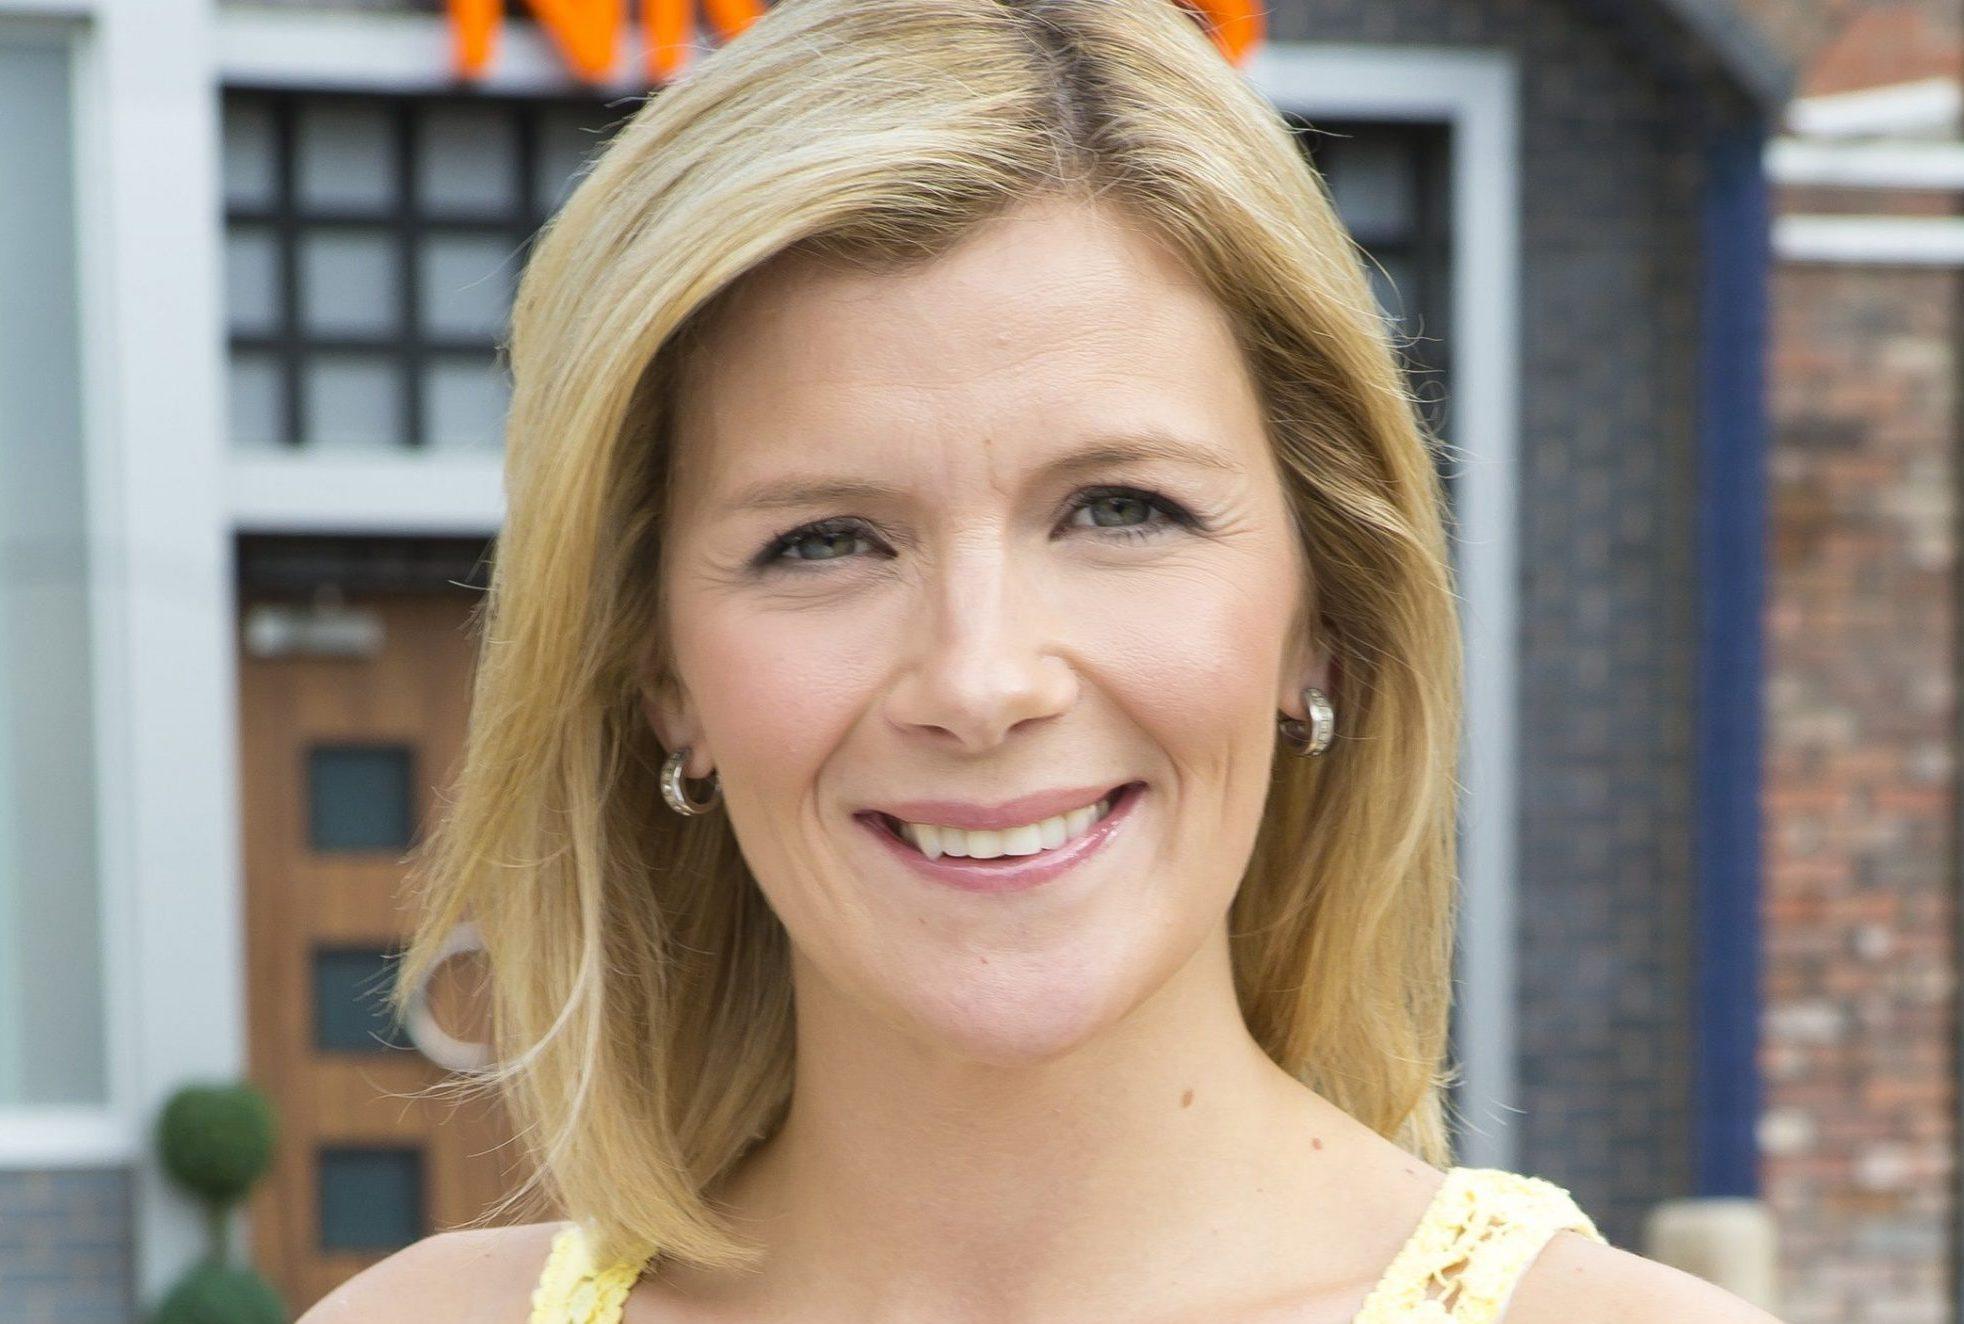 Coronation Street's Leanne Battersby set for 'huge storyline'